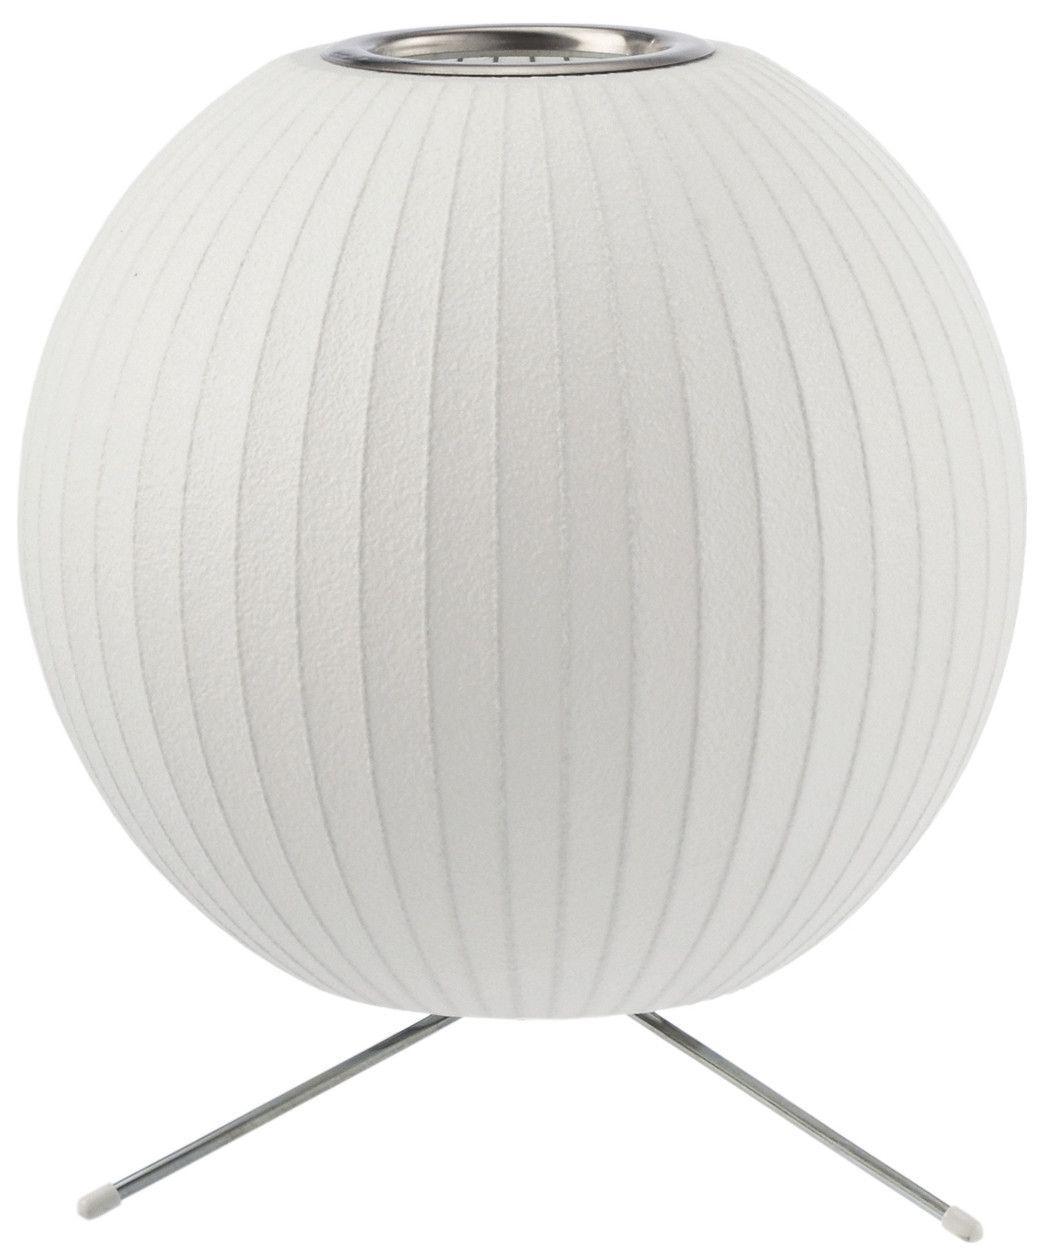 Nelson Ball Tripod Lamp Nelson bubble lamp, Tripod table